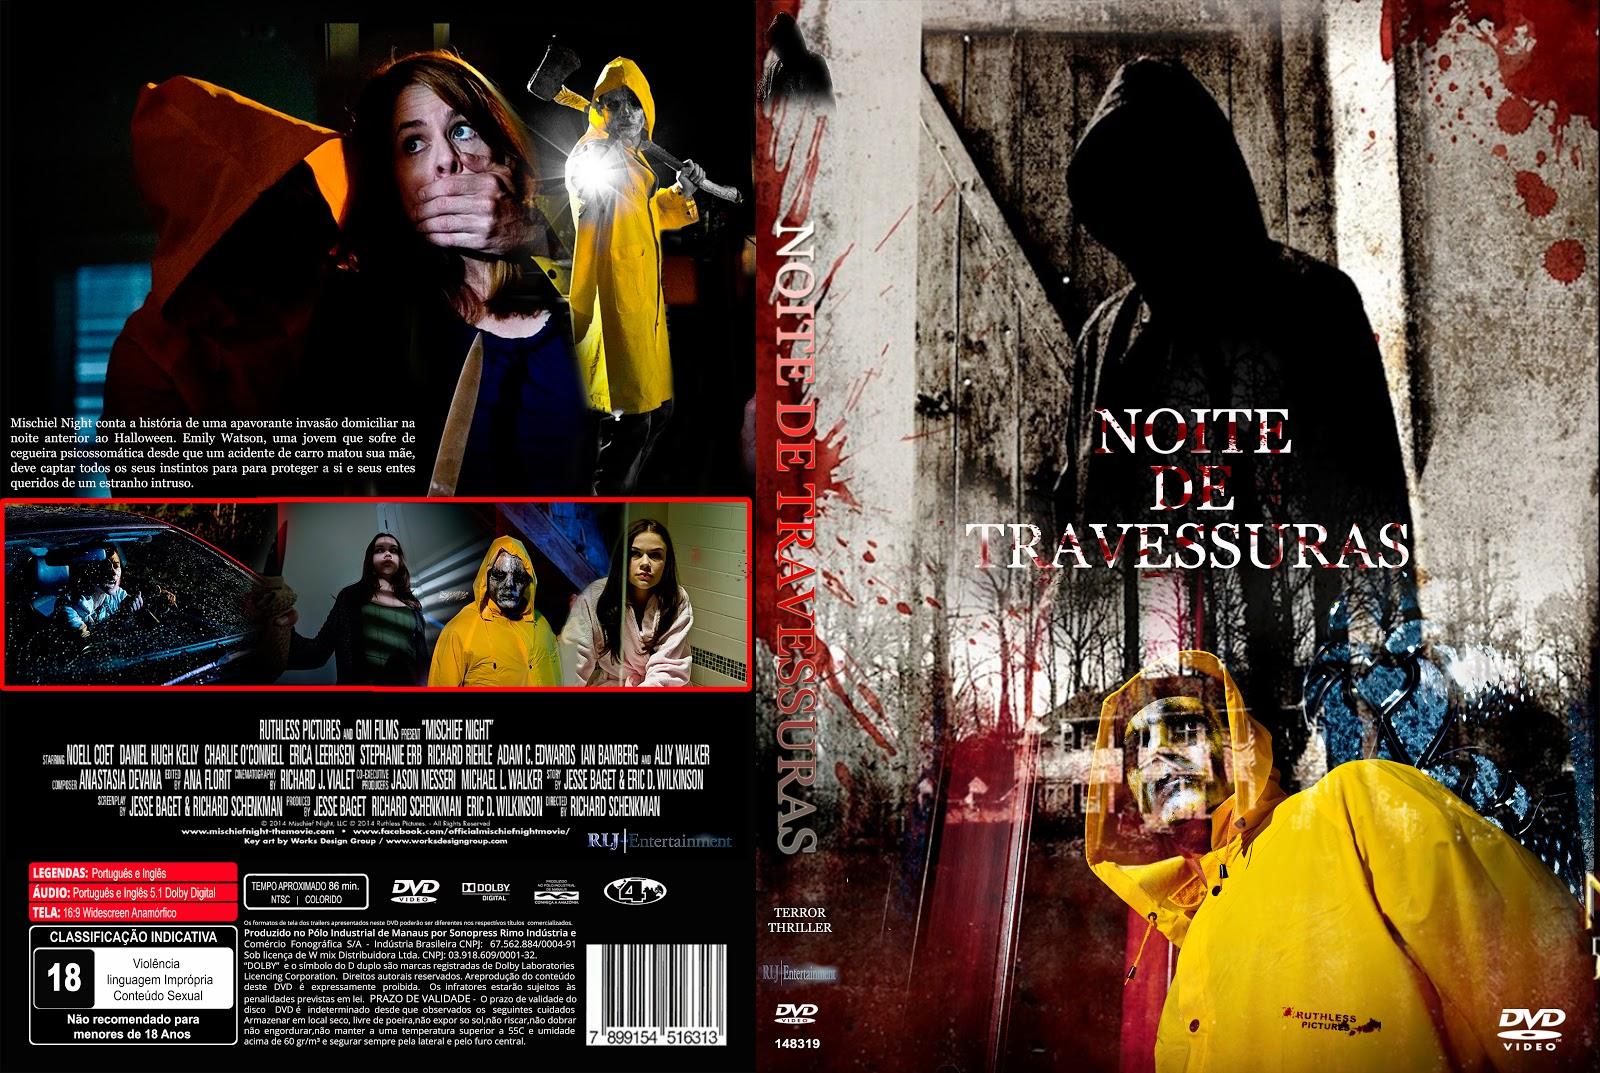 Capa DVD Noite De Travessuras